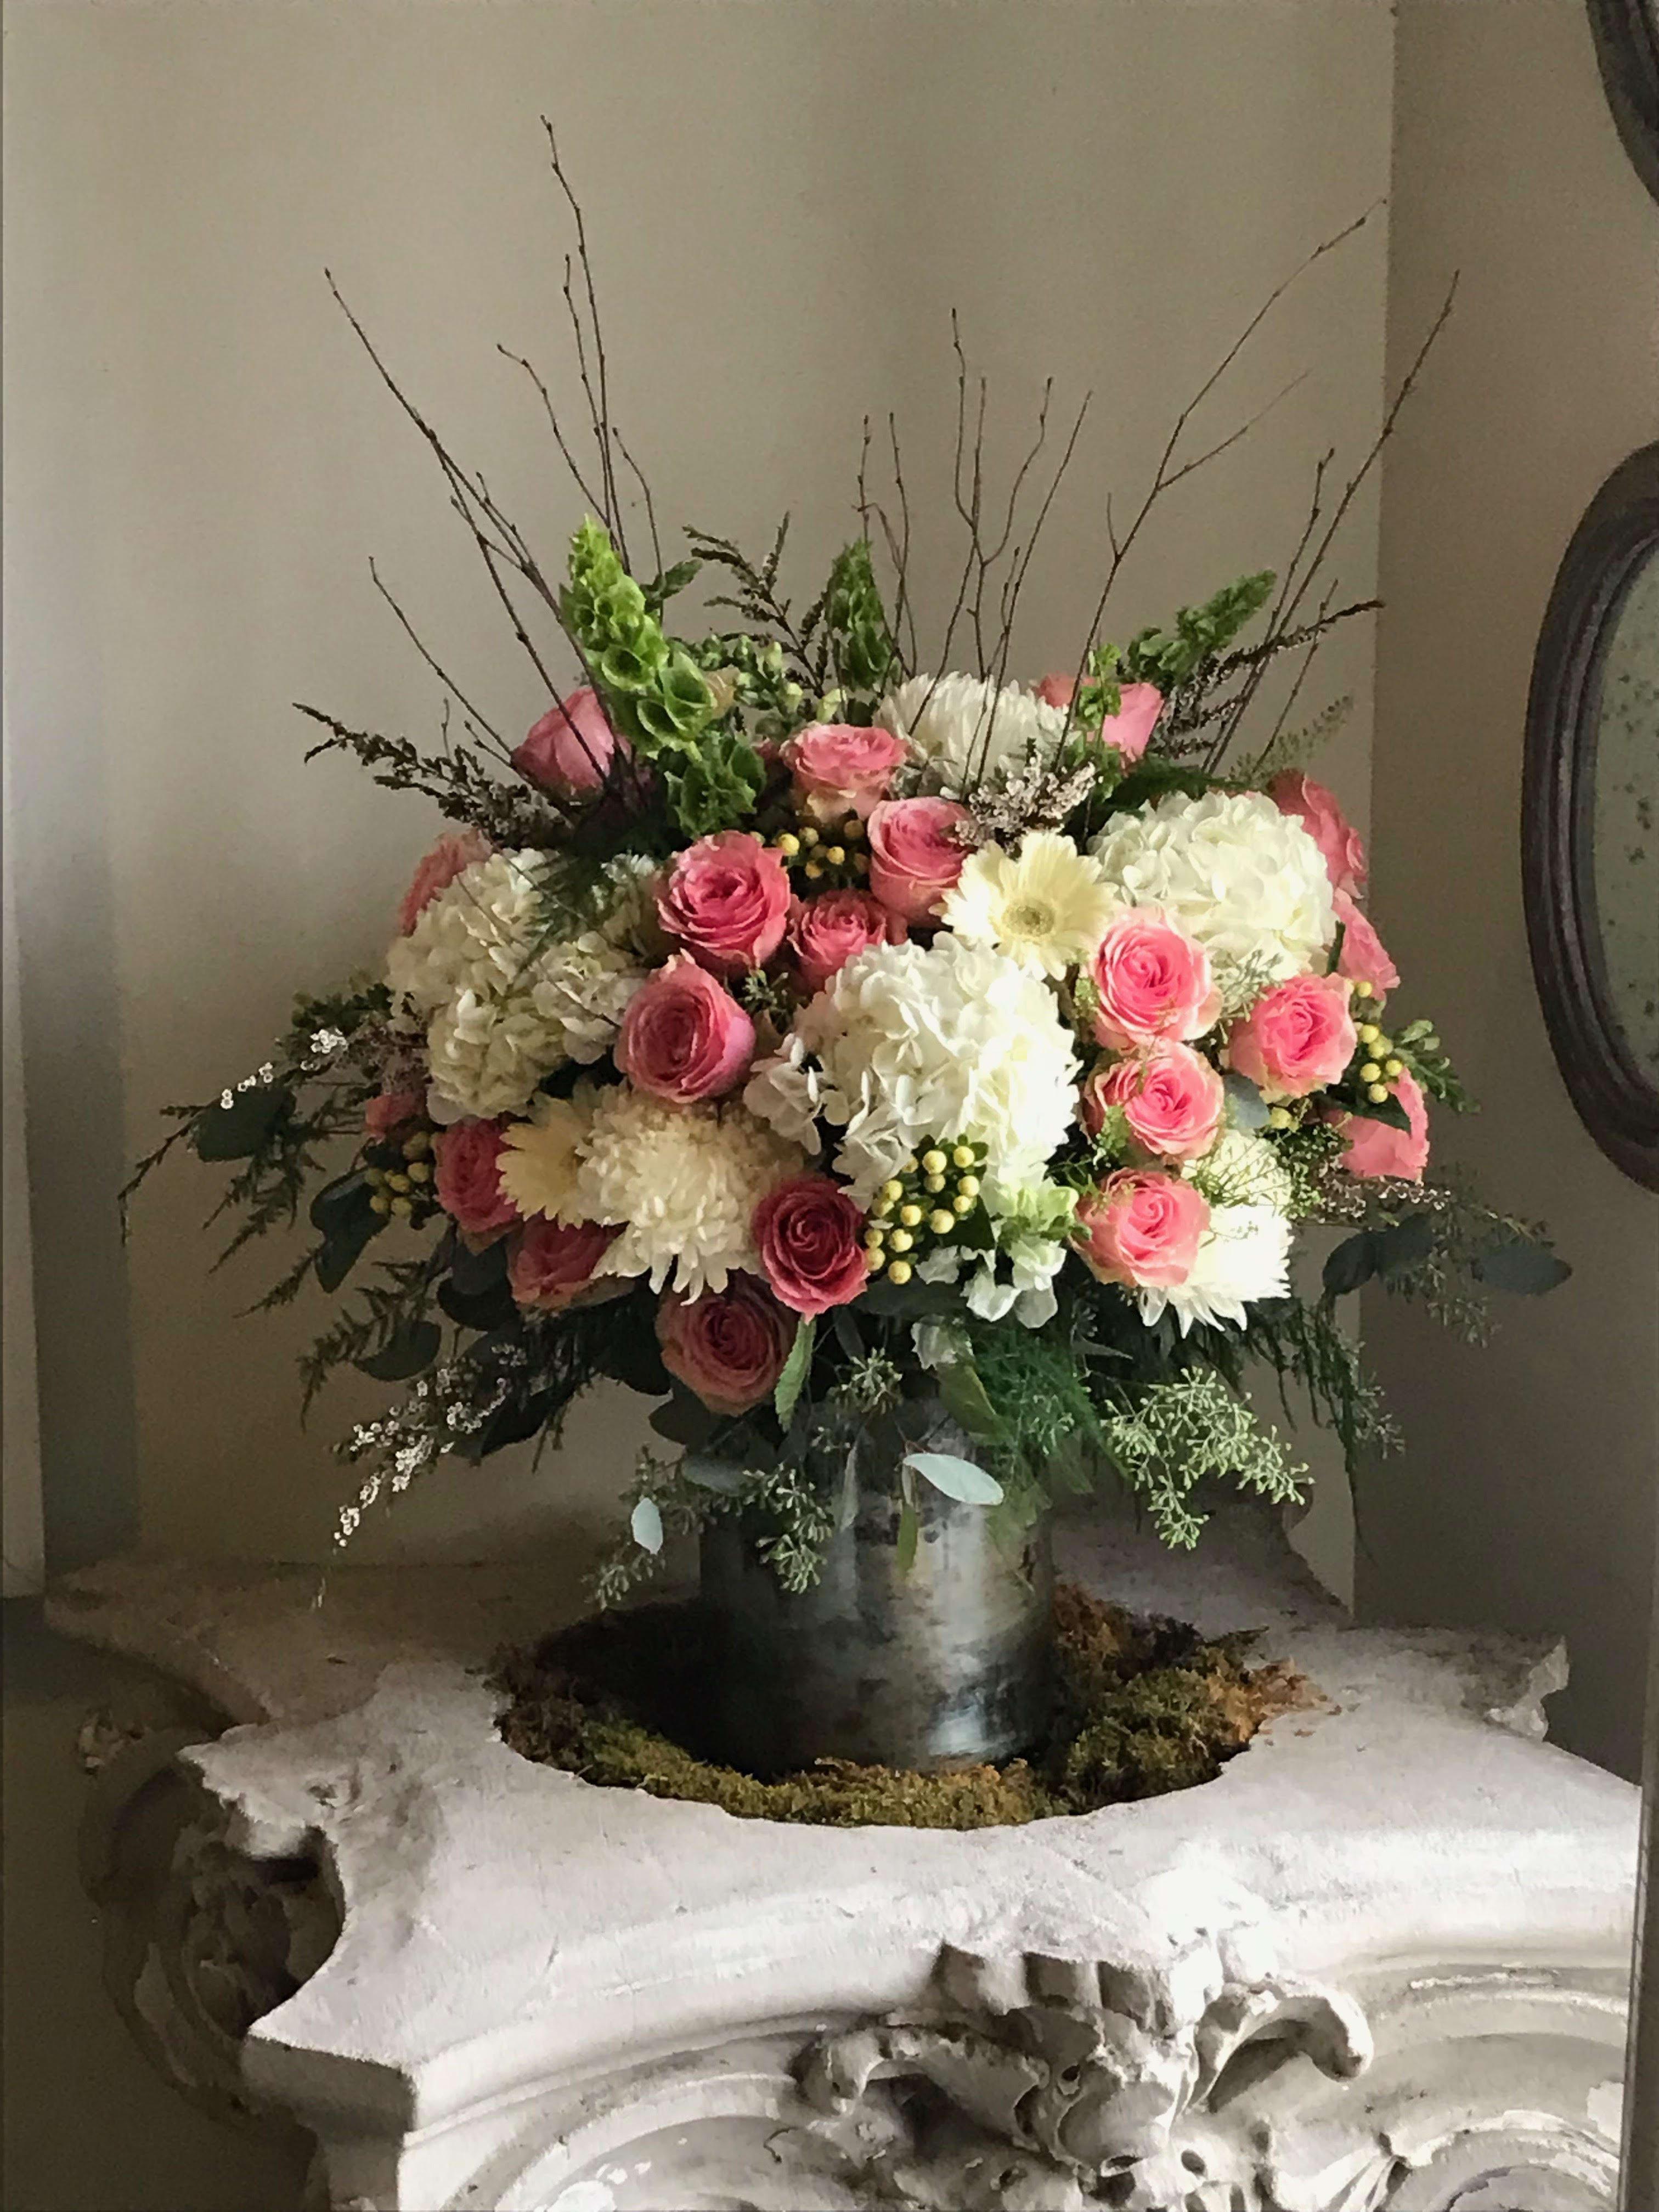 Hydrangea Spray Roses Bells Of Ireland Hypericum Birch Branch